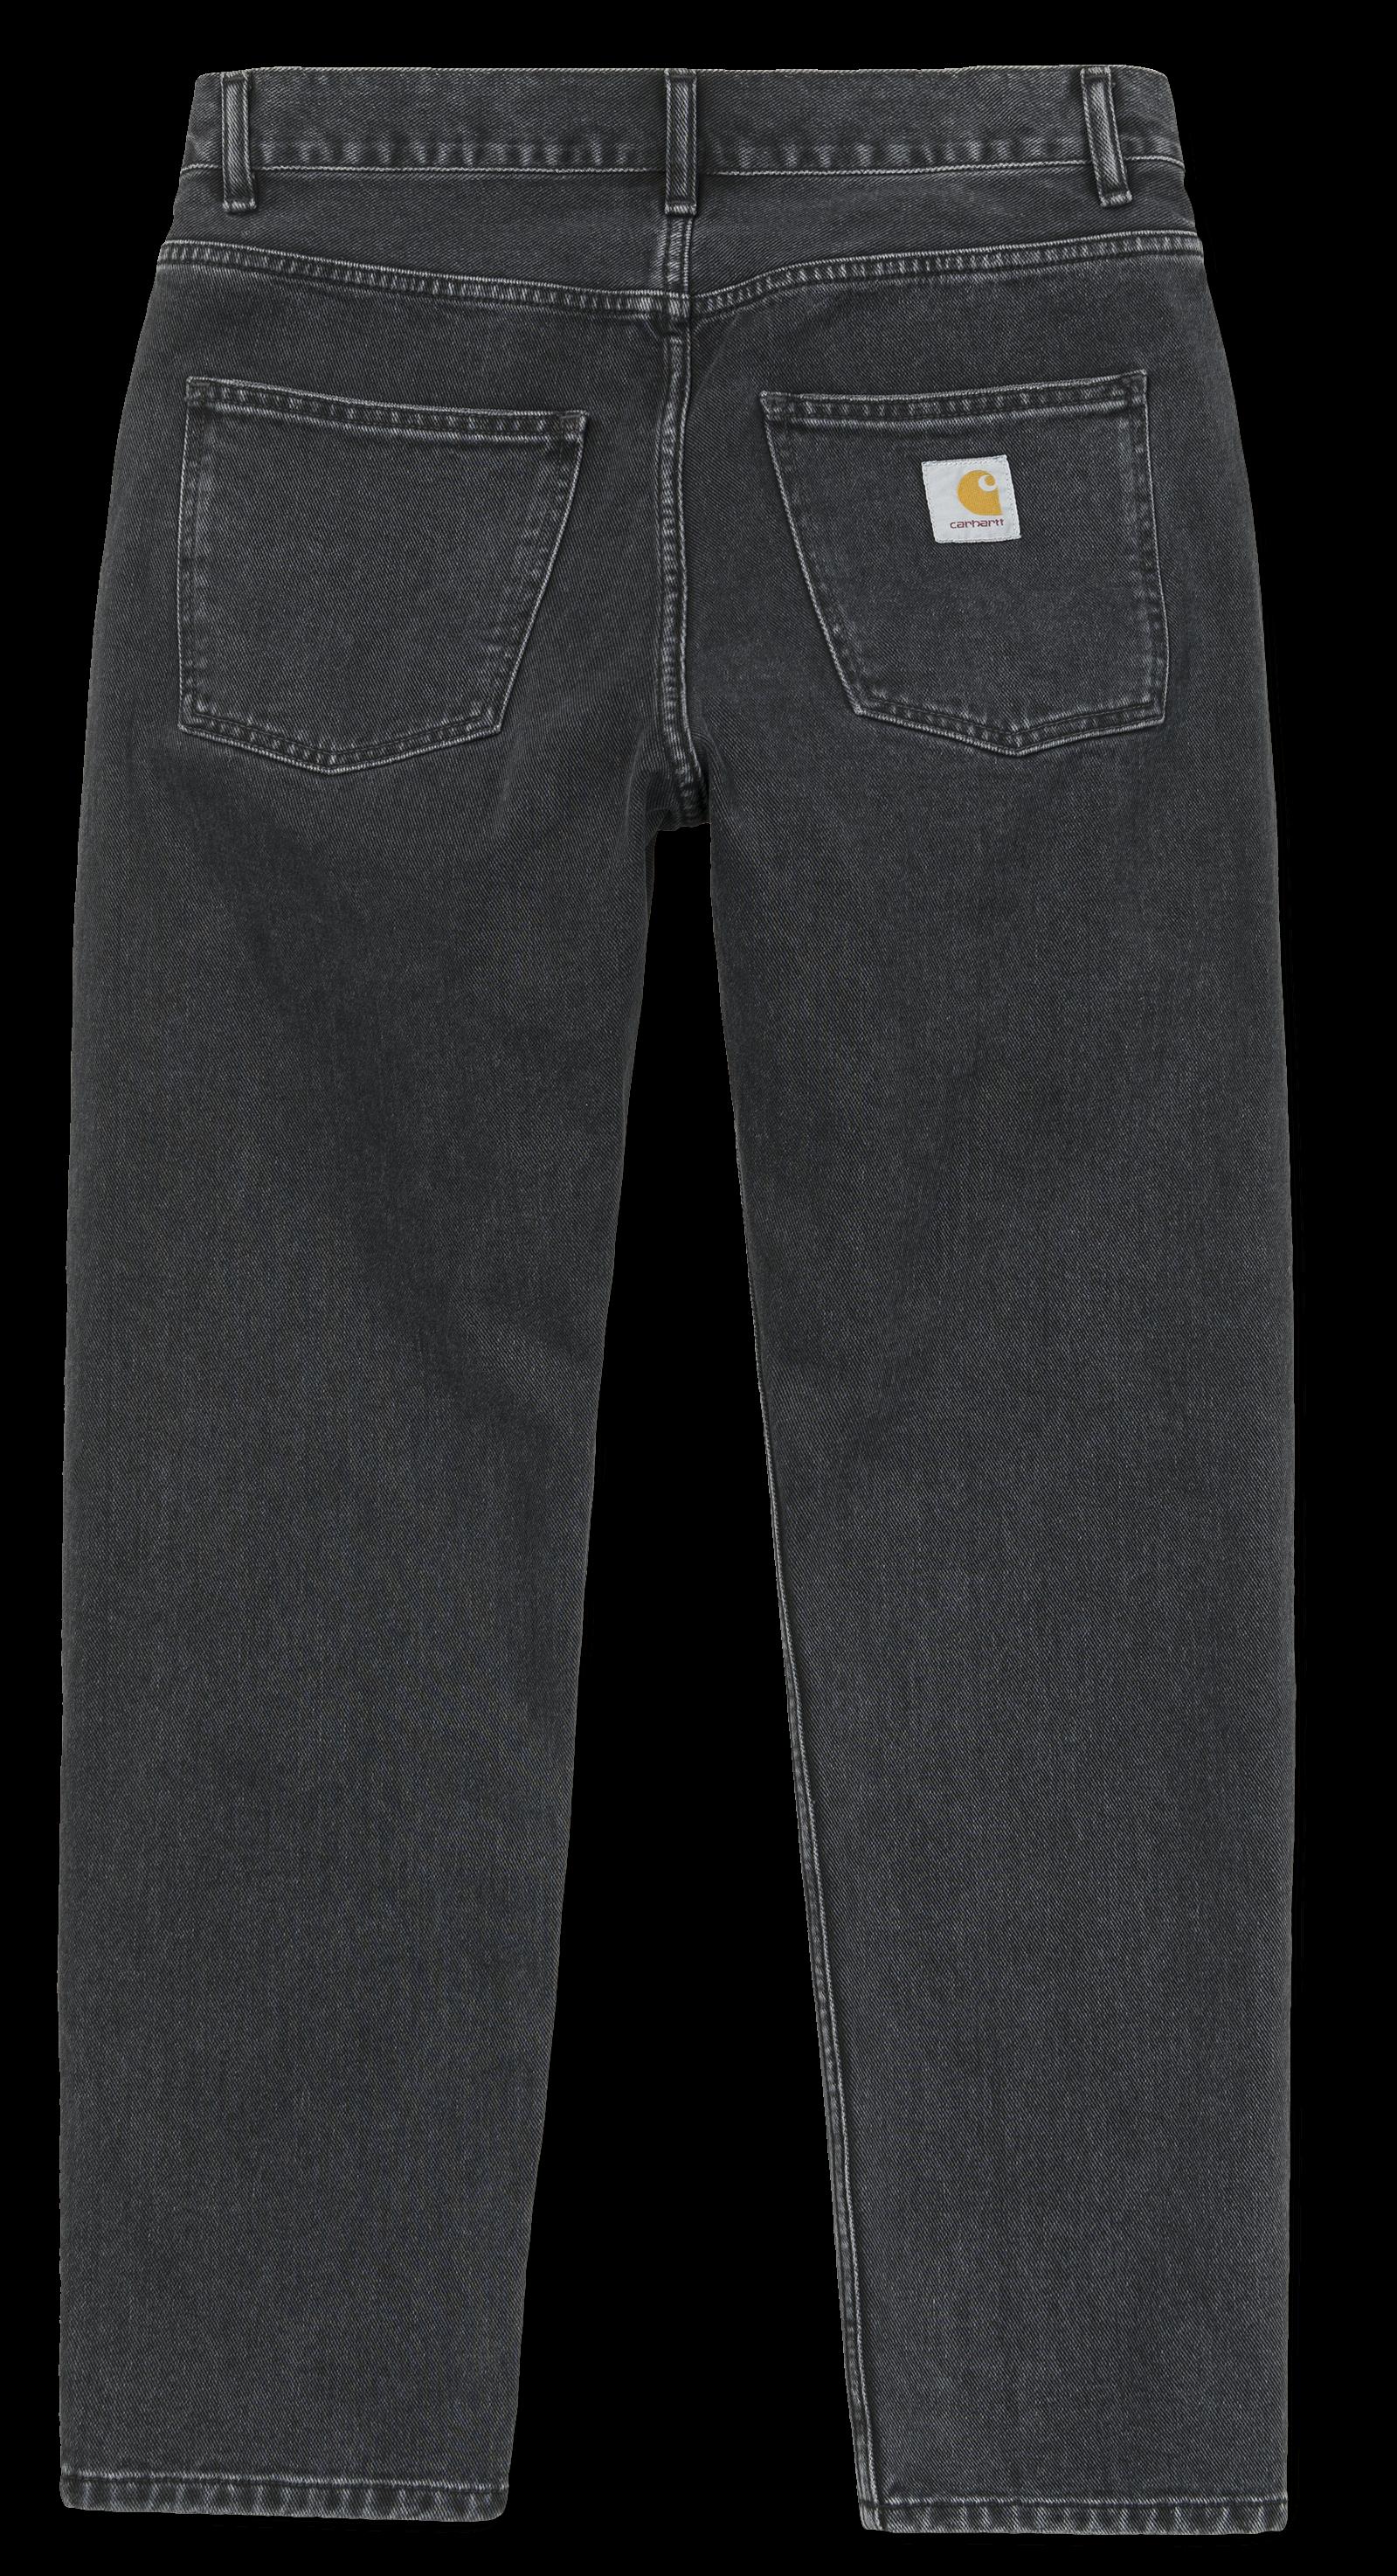 CARHARTT Herren Jeans Newel Pant Black Stone Washed